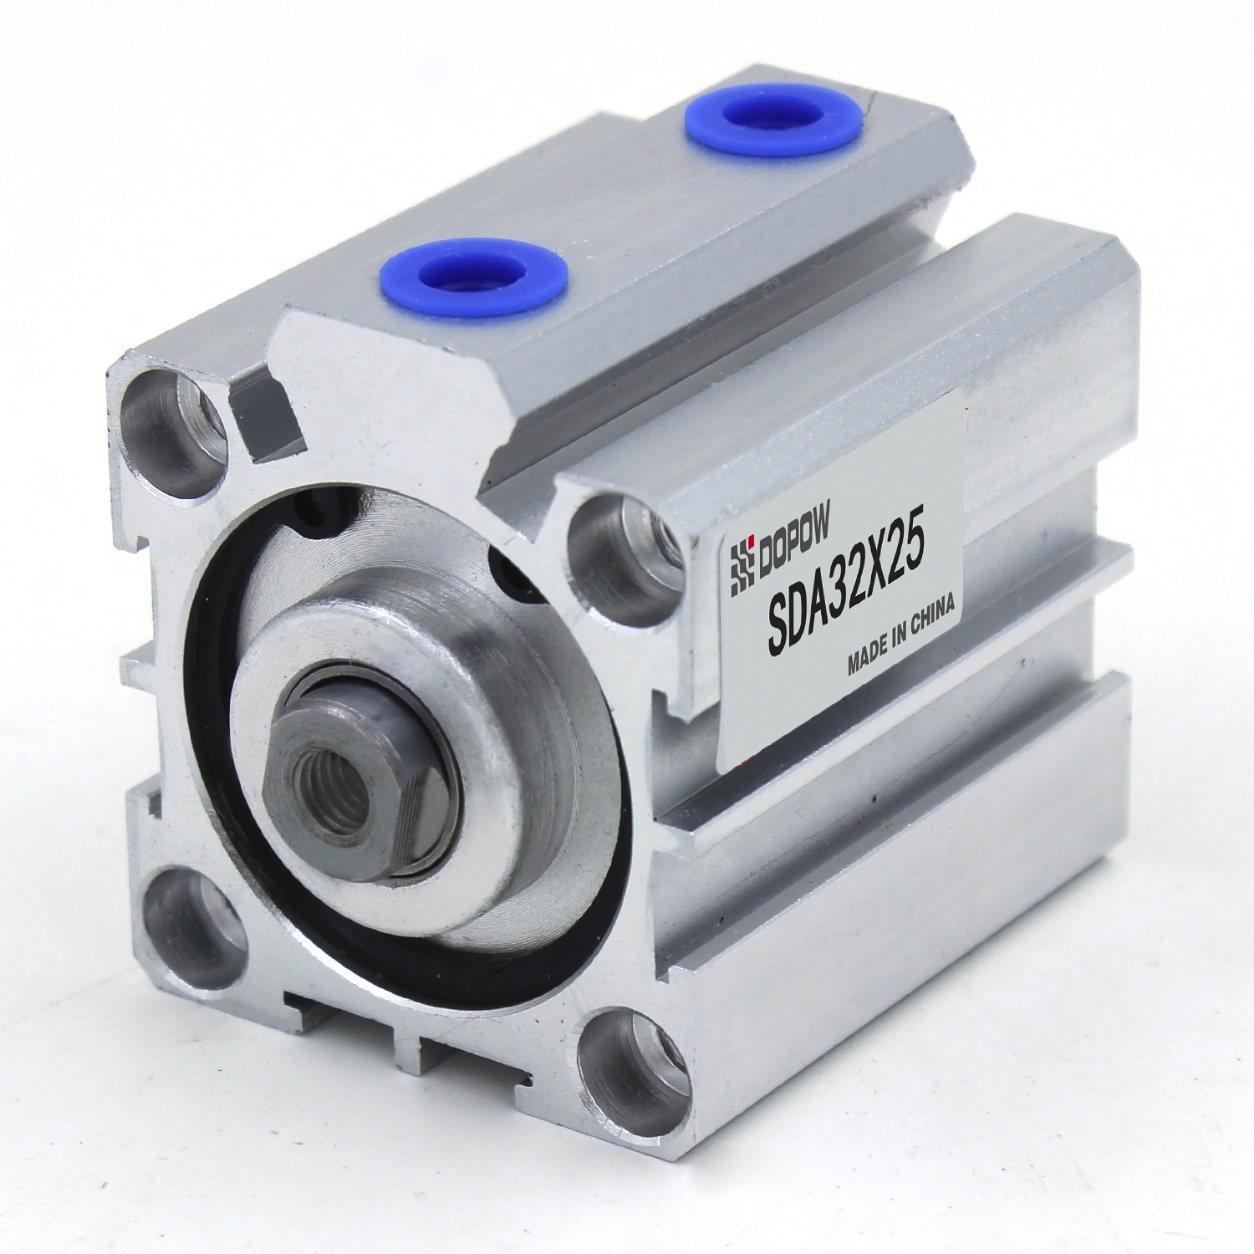 Dopow Sda32-25 Compact Pneumatic Cylinder